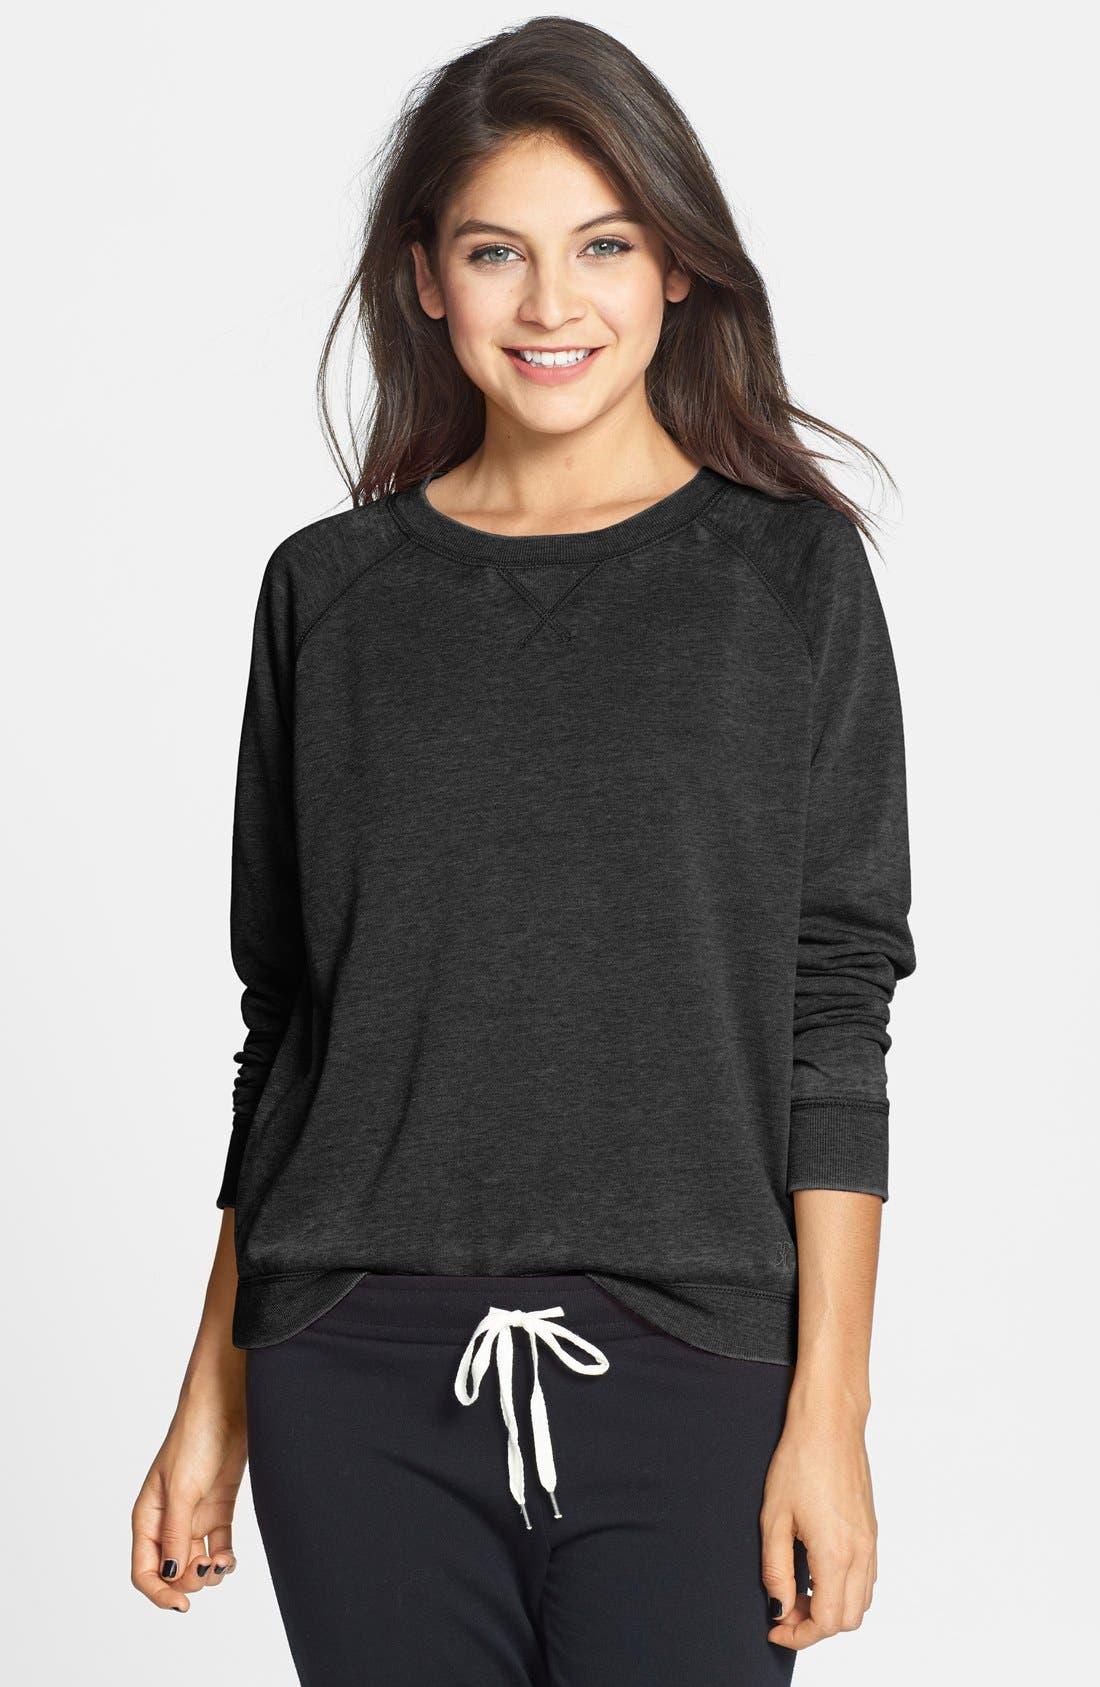 Alternate Image 1 Selected - BP. Undercover 'Gym Class' Crewneck Sweatshirt (Juniors)